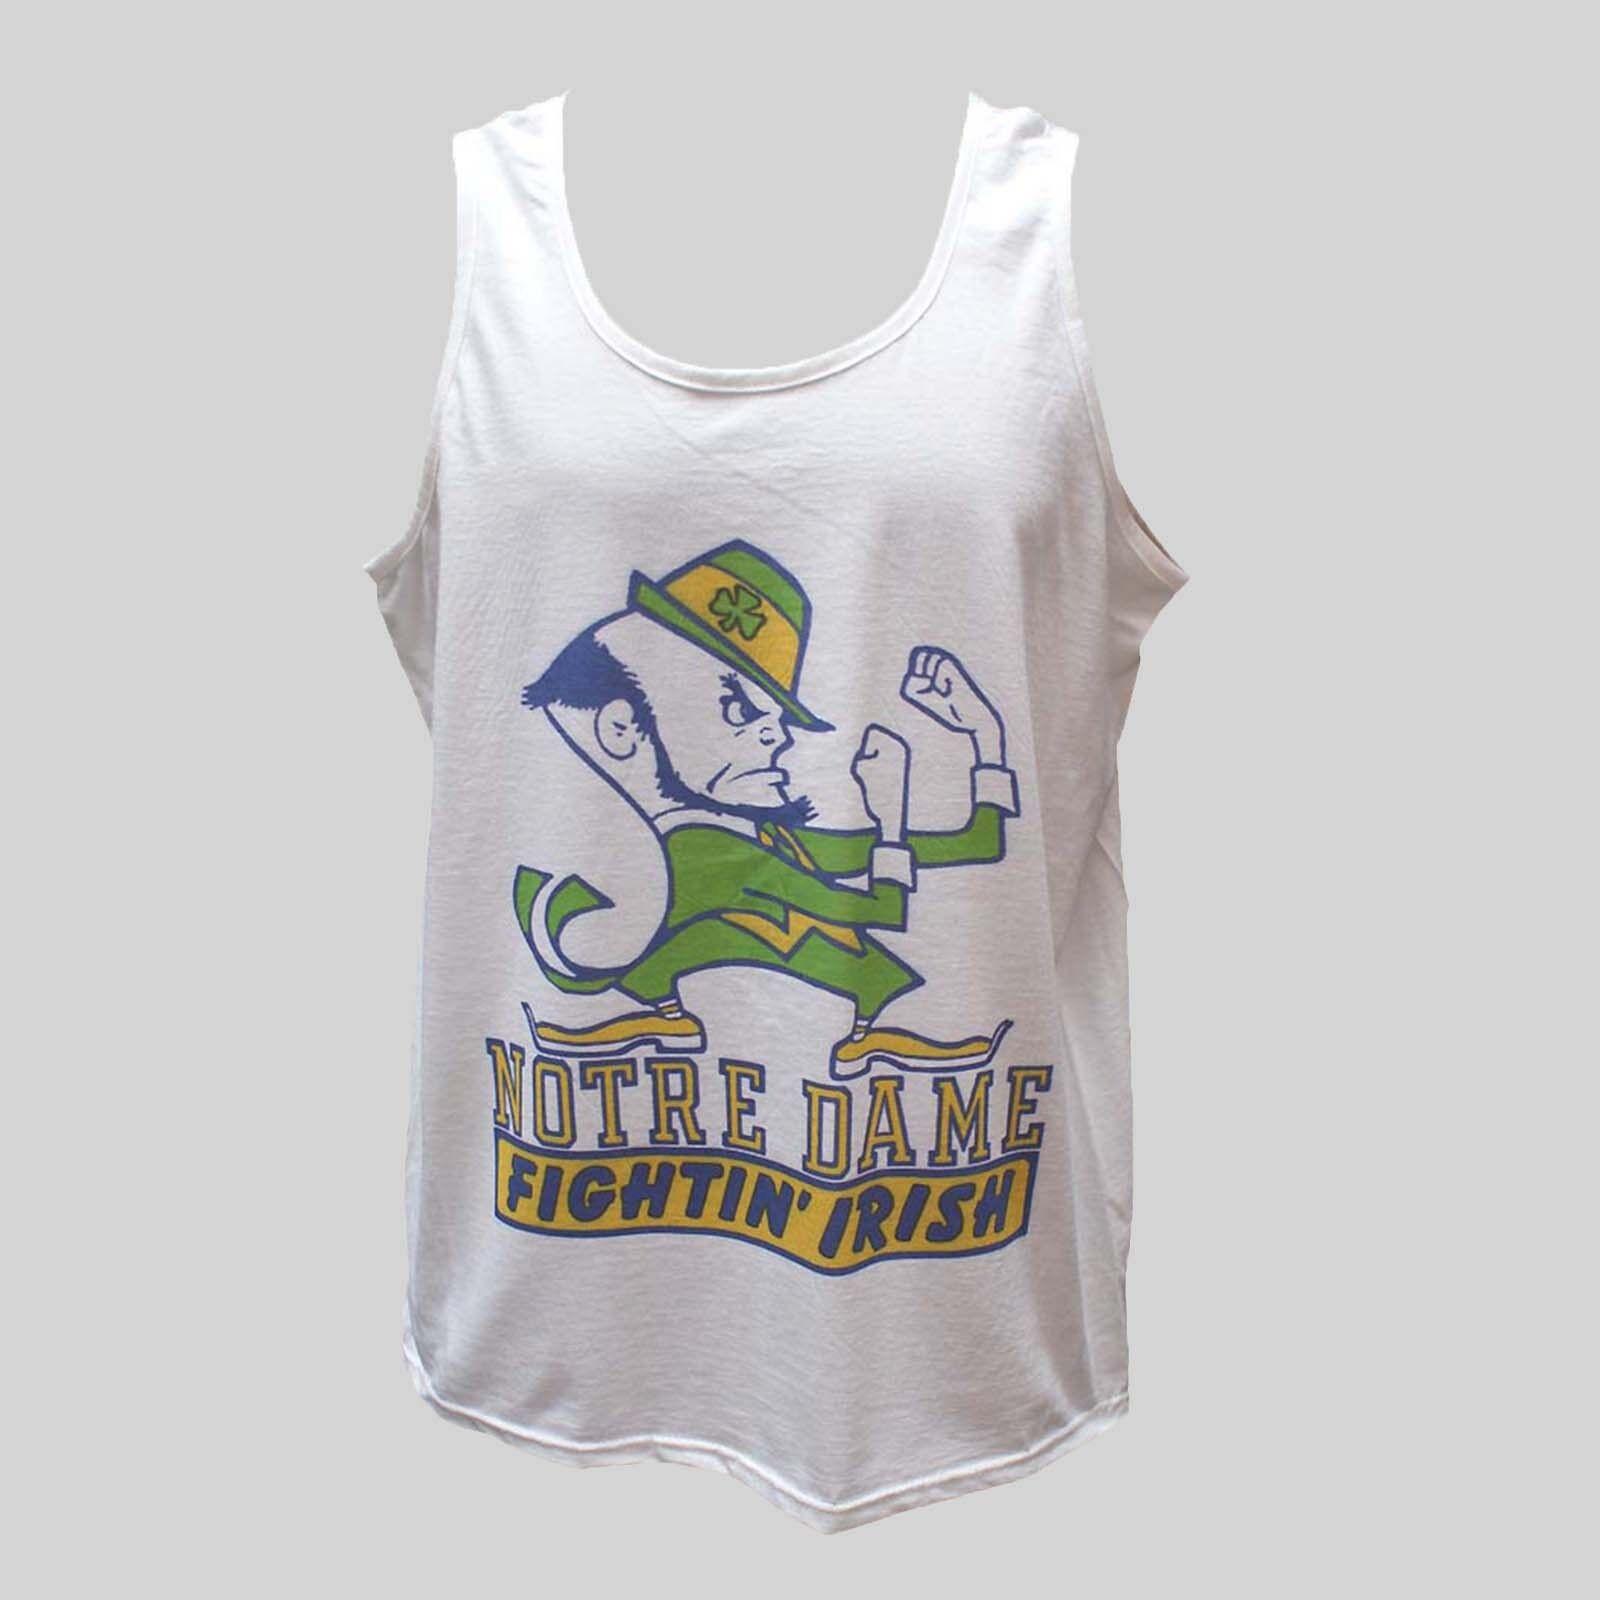 Irish party fun alcool T-shirt Unisexe Blanc Débardeur Tank Tank Tank Top Punk Rock S-2XL f16731